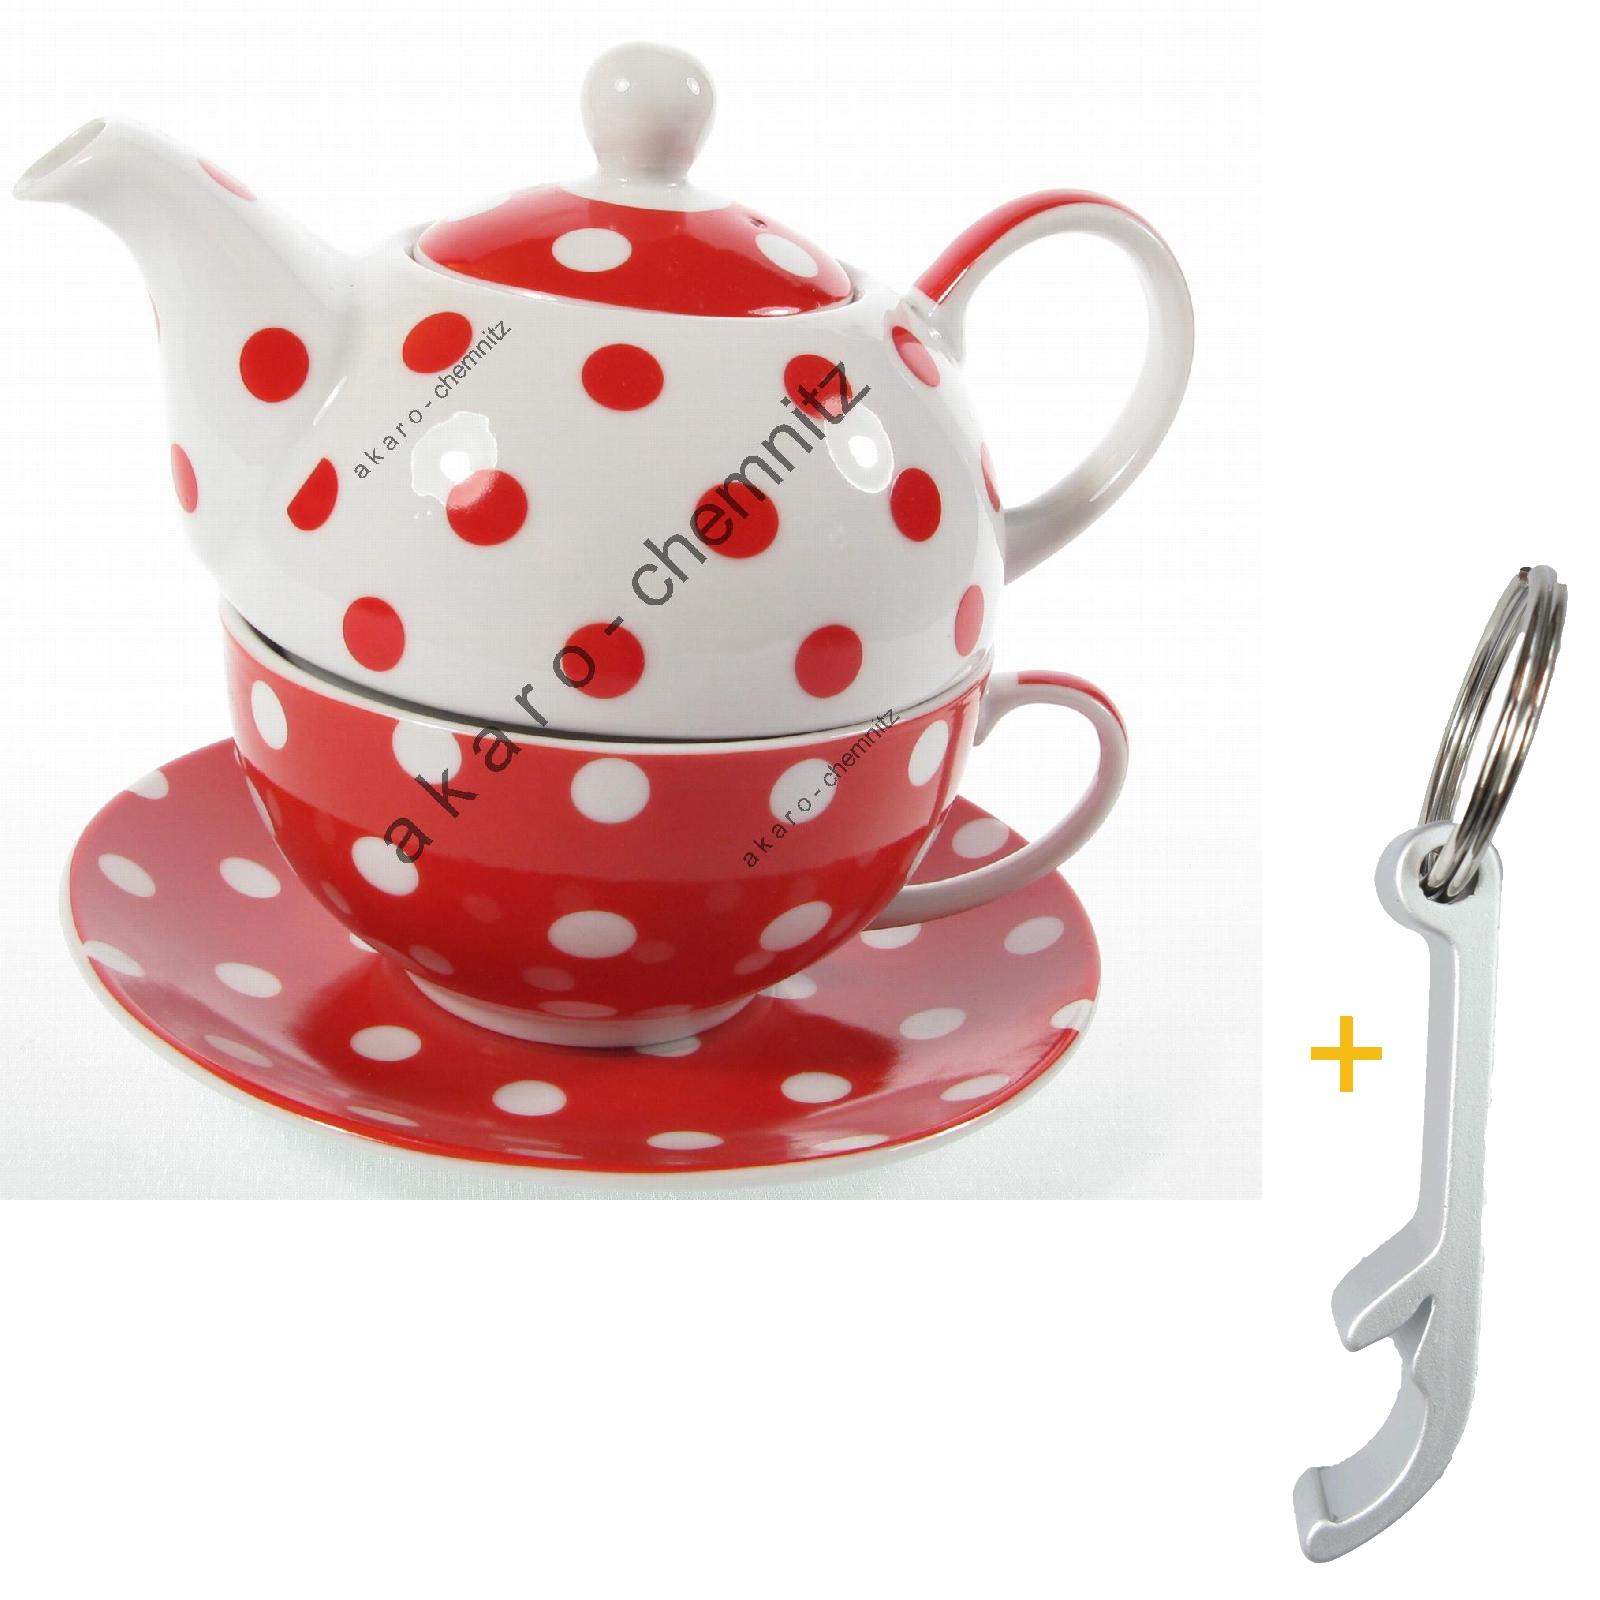 rot tea for one teekanne punkte kanne weiss set 4334 tasse 2 in 1 porzellan ebay. Black Bedroom Furniture Sets. Home Design Ideas